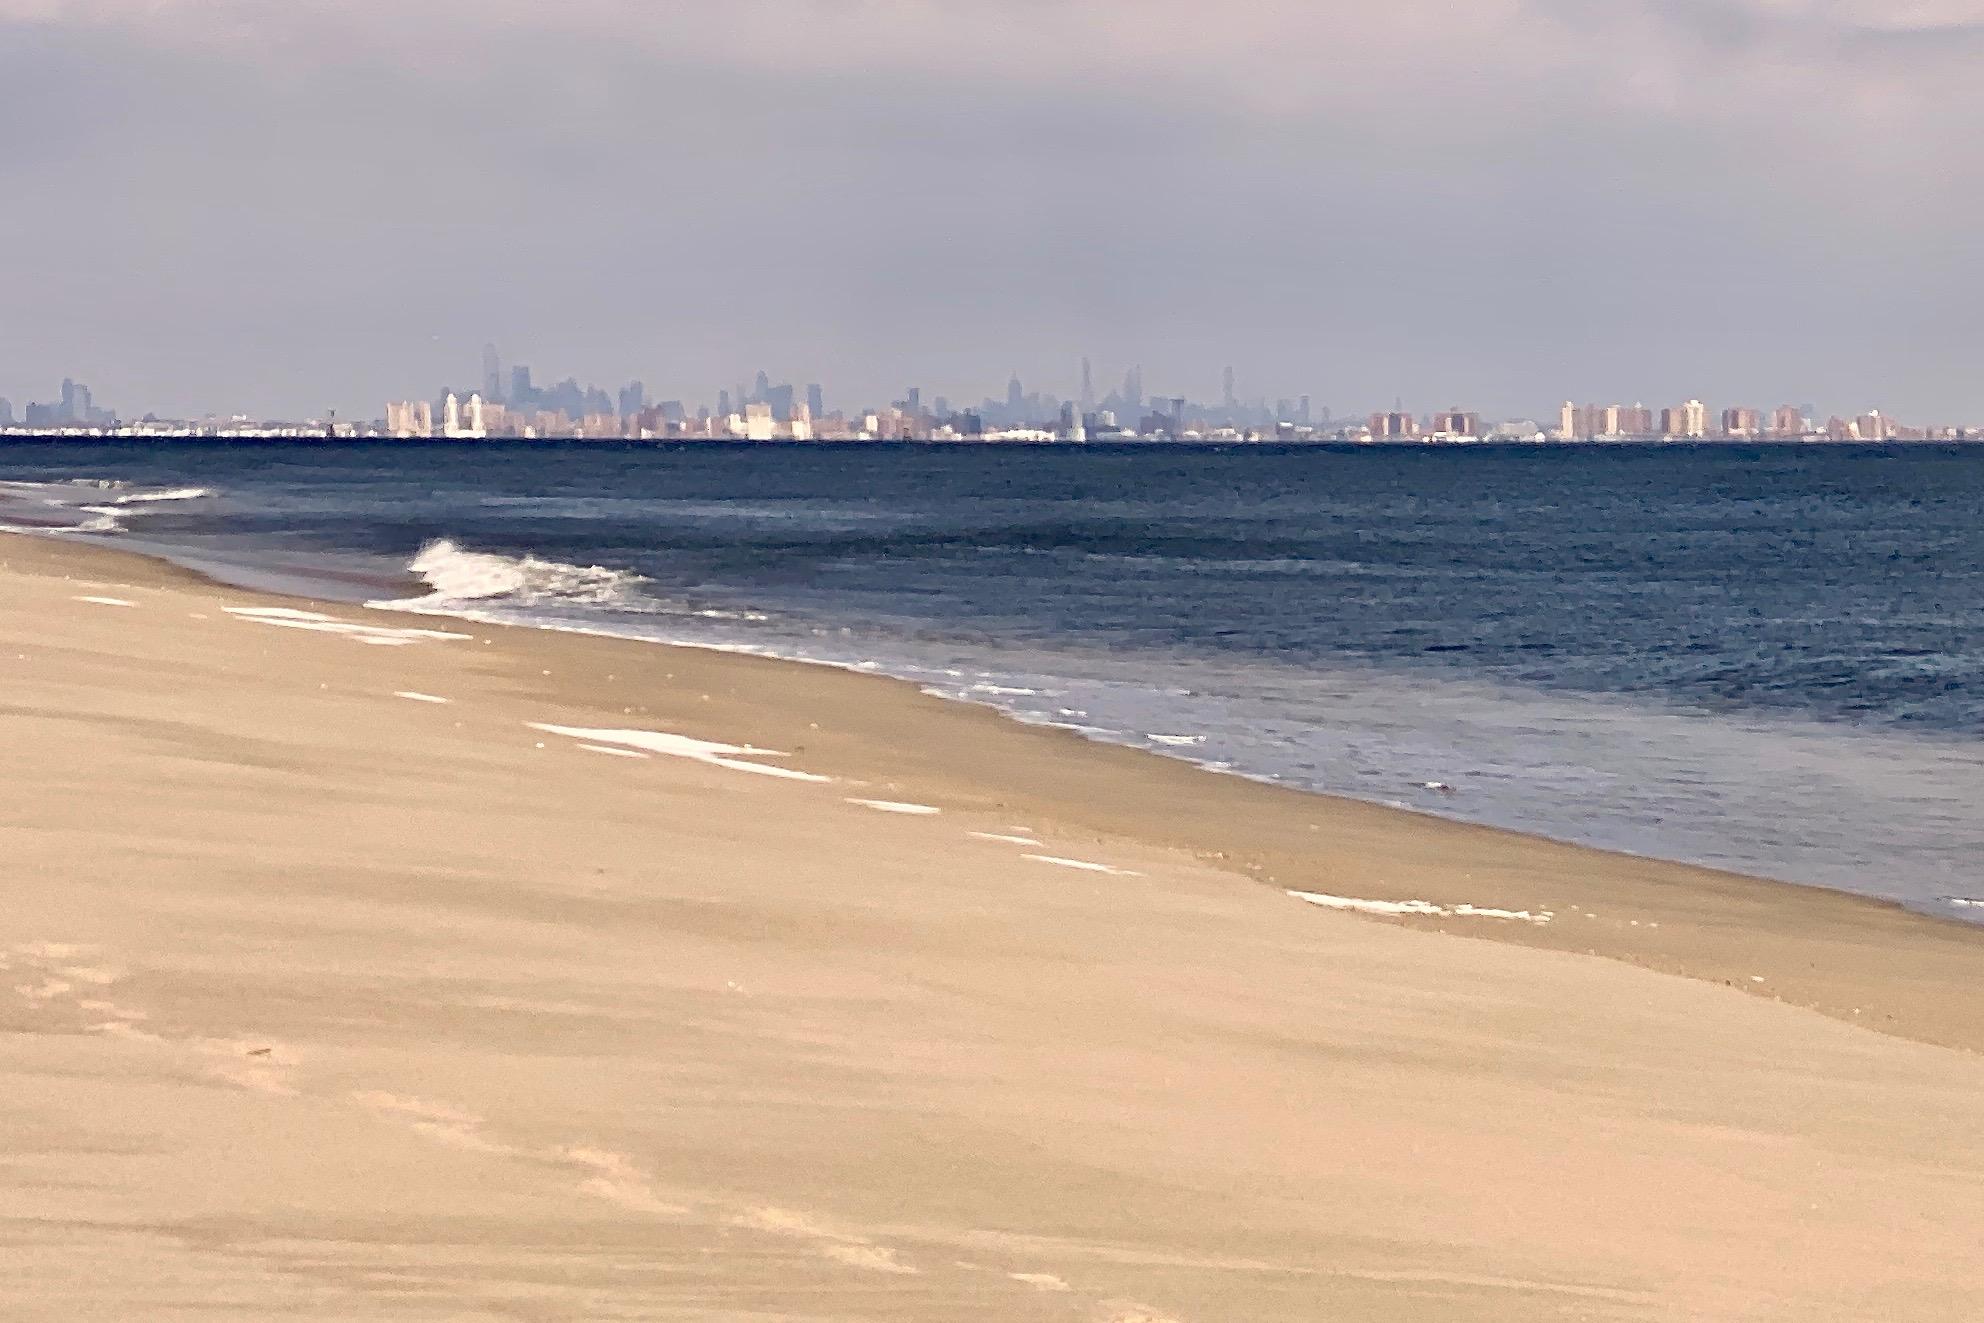 Empty beach and NYC skyline at Sandy Hook, a super east coast beach town